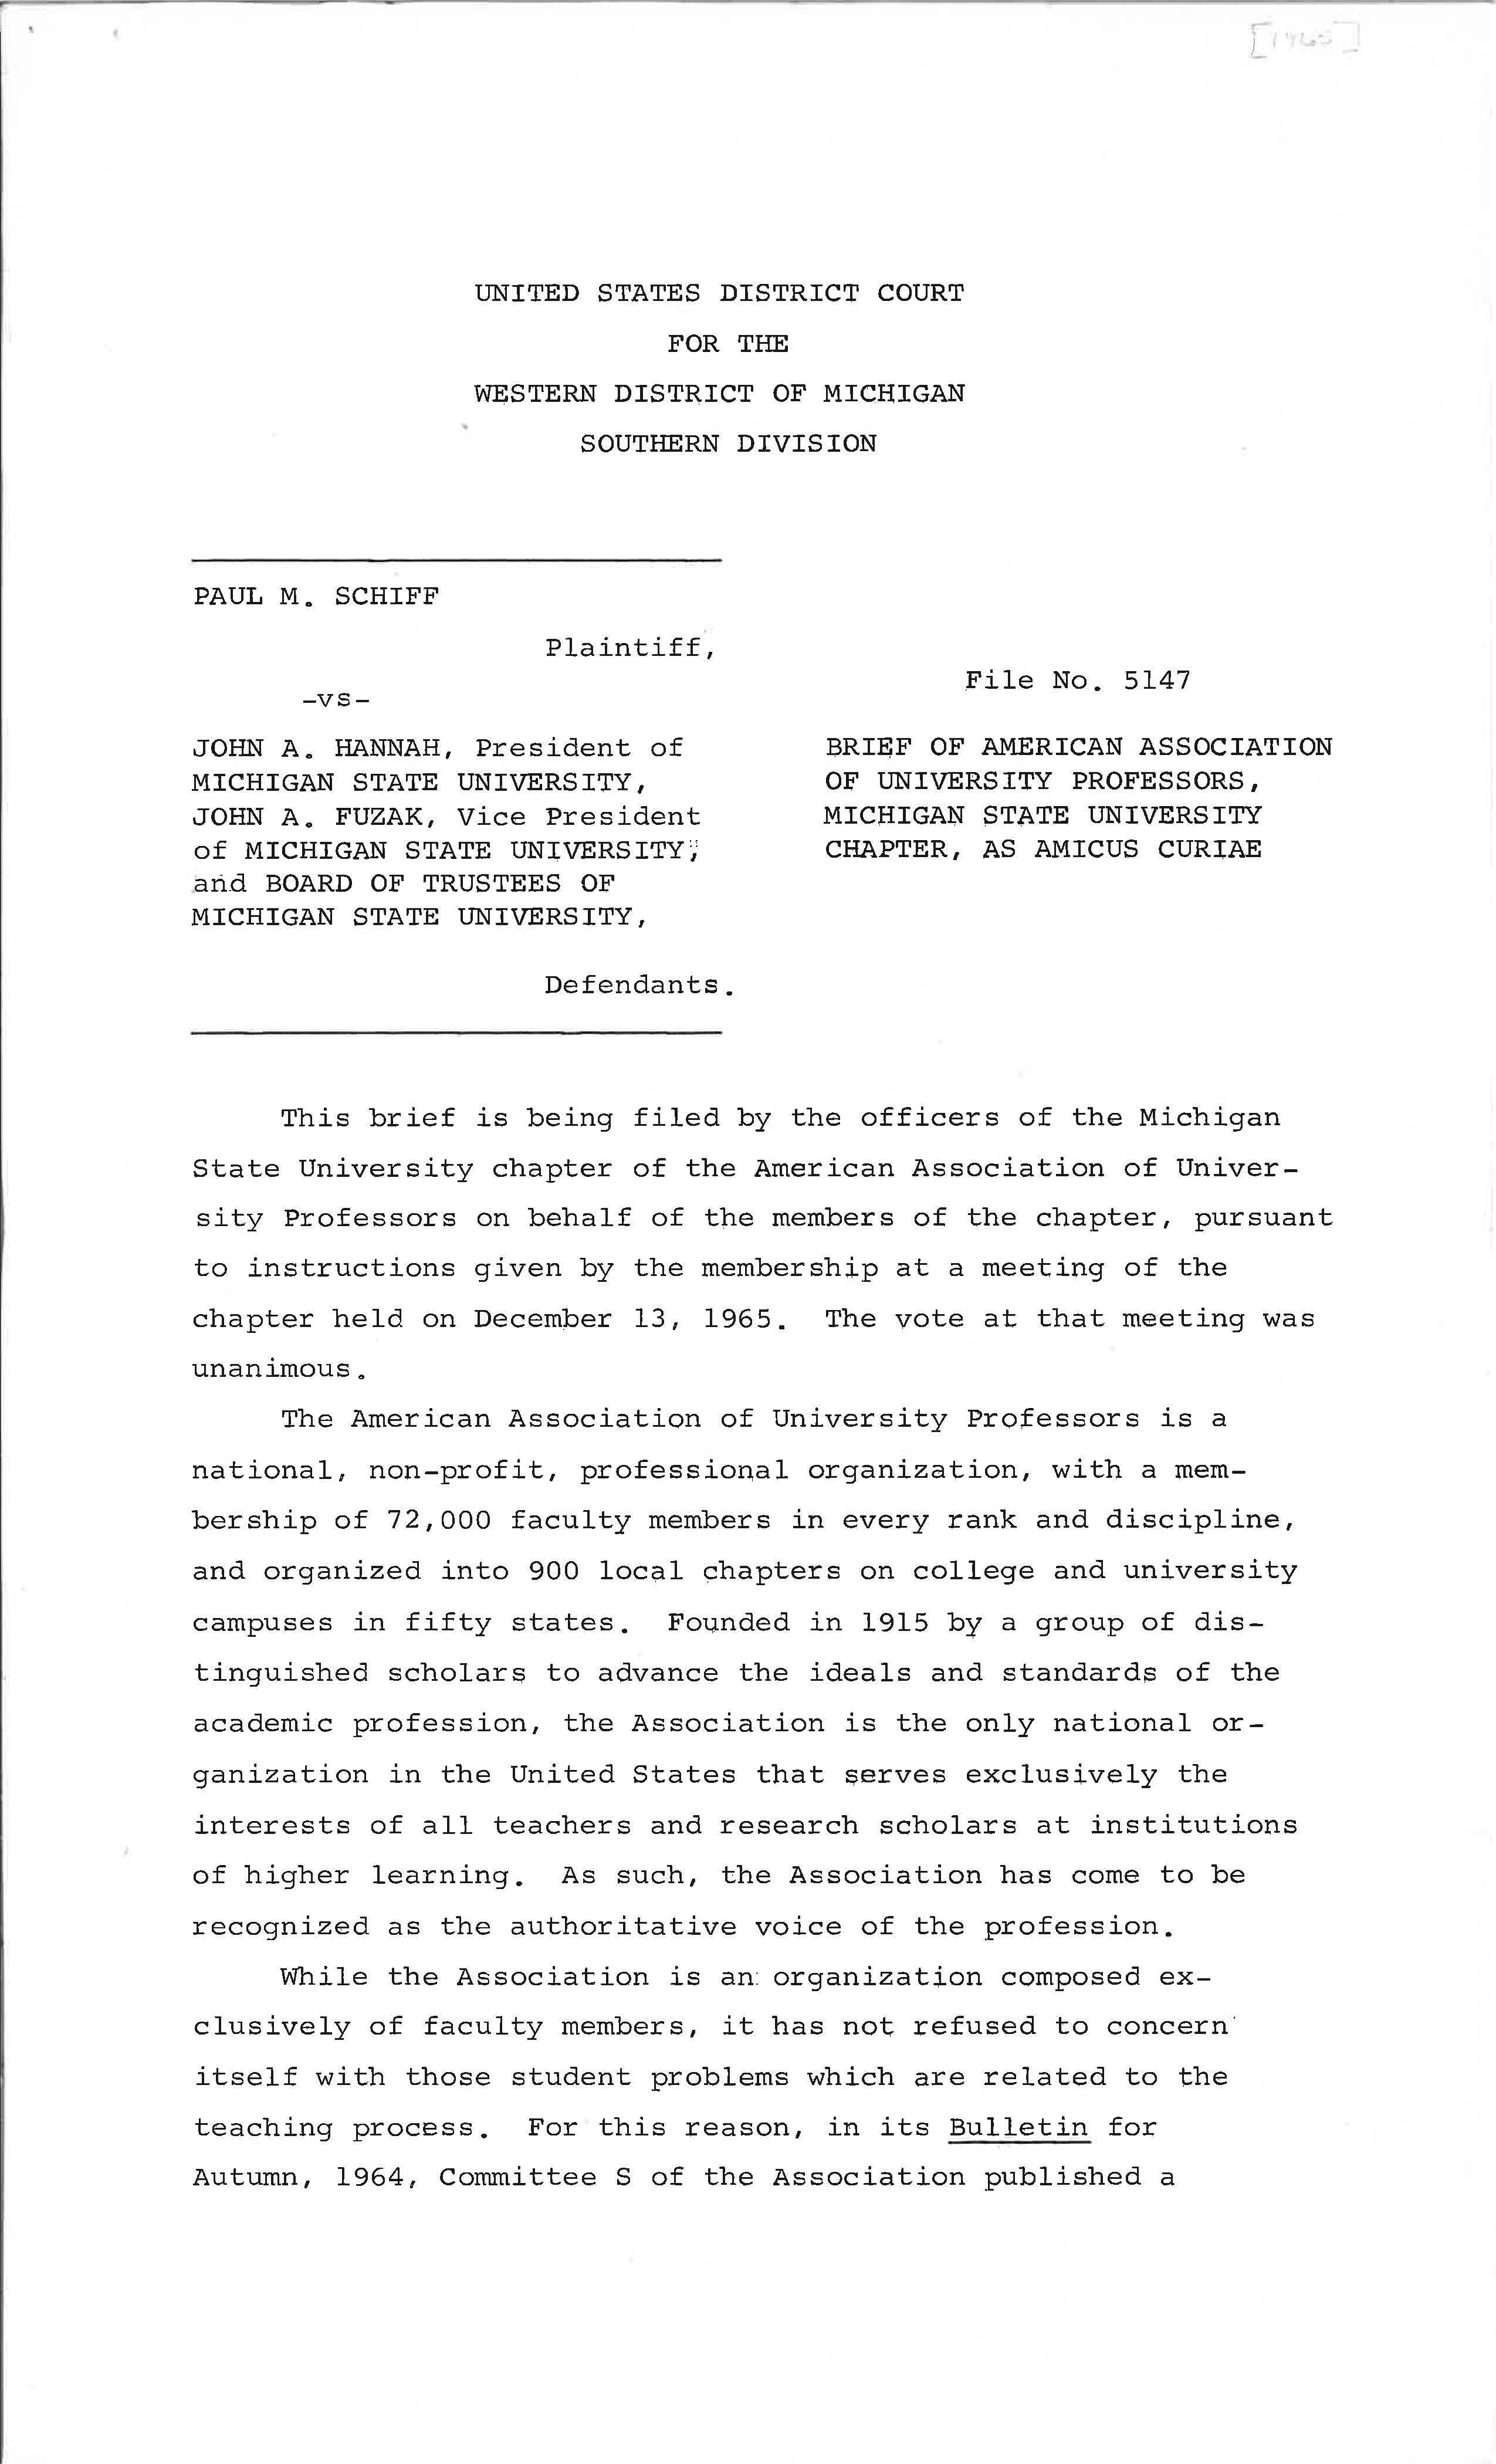 Brief of American Association of University Professors, MSU, 1965